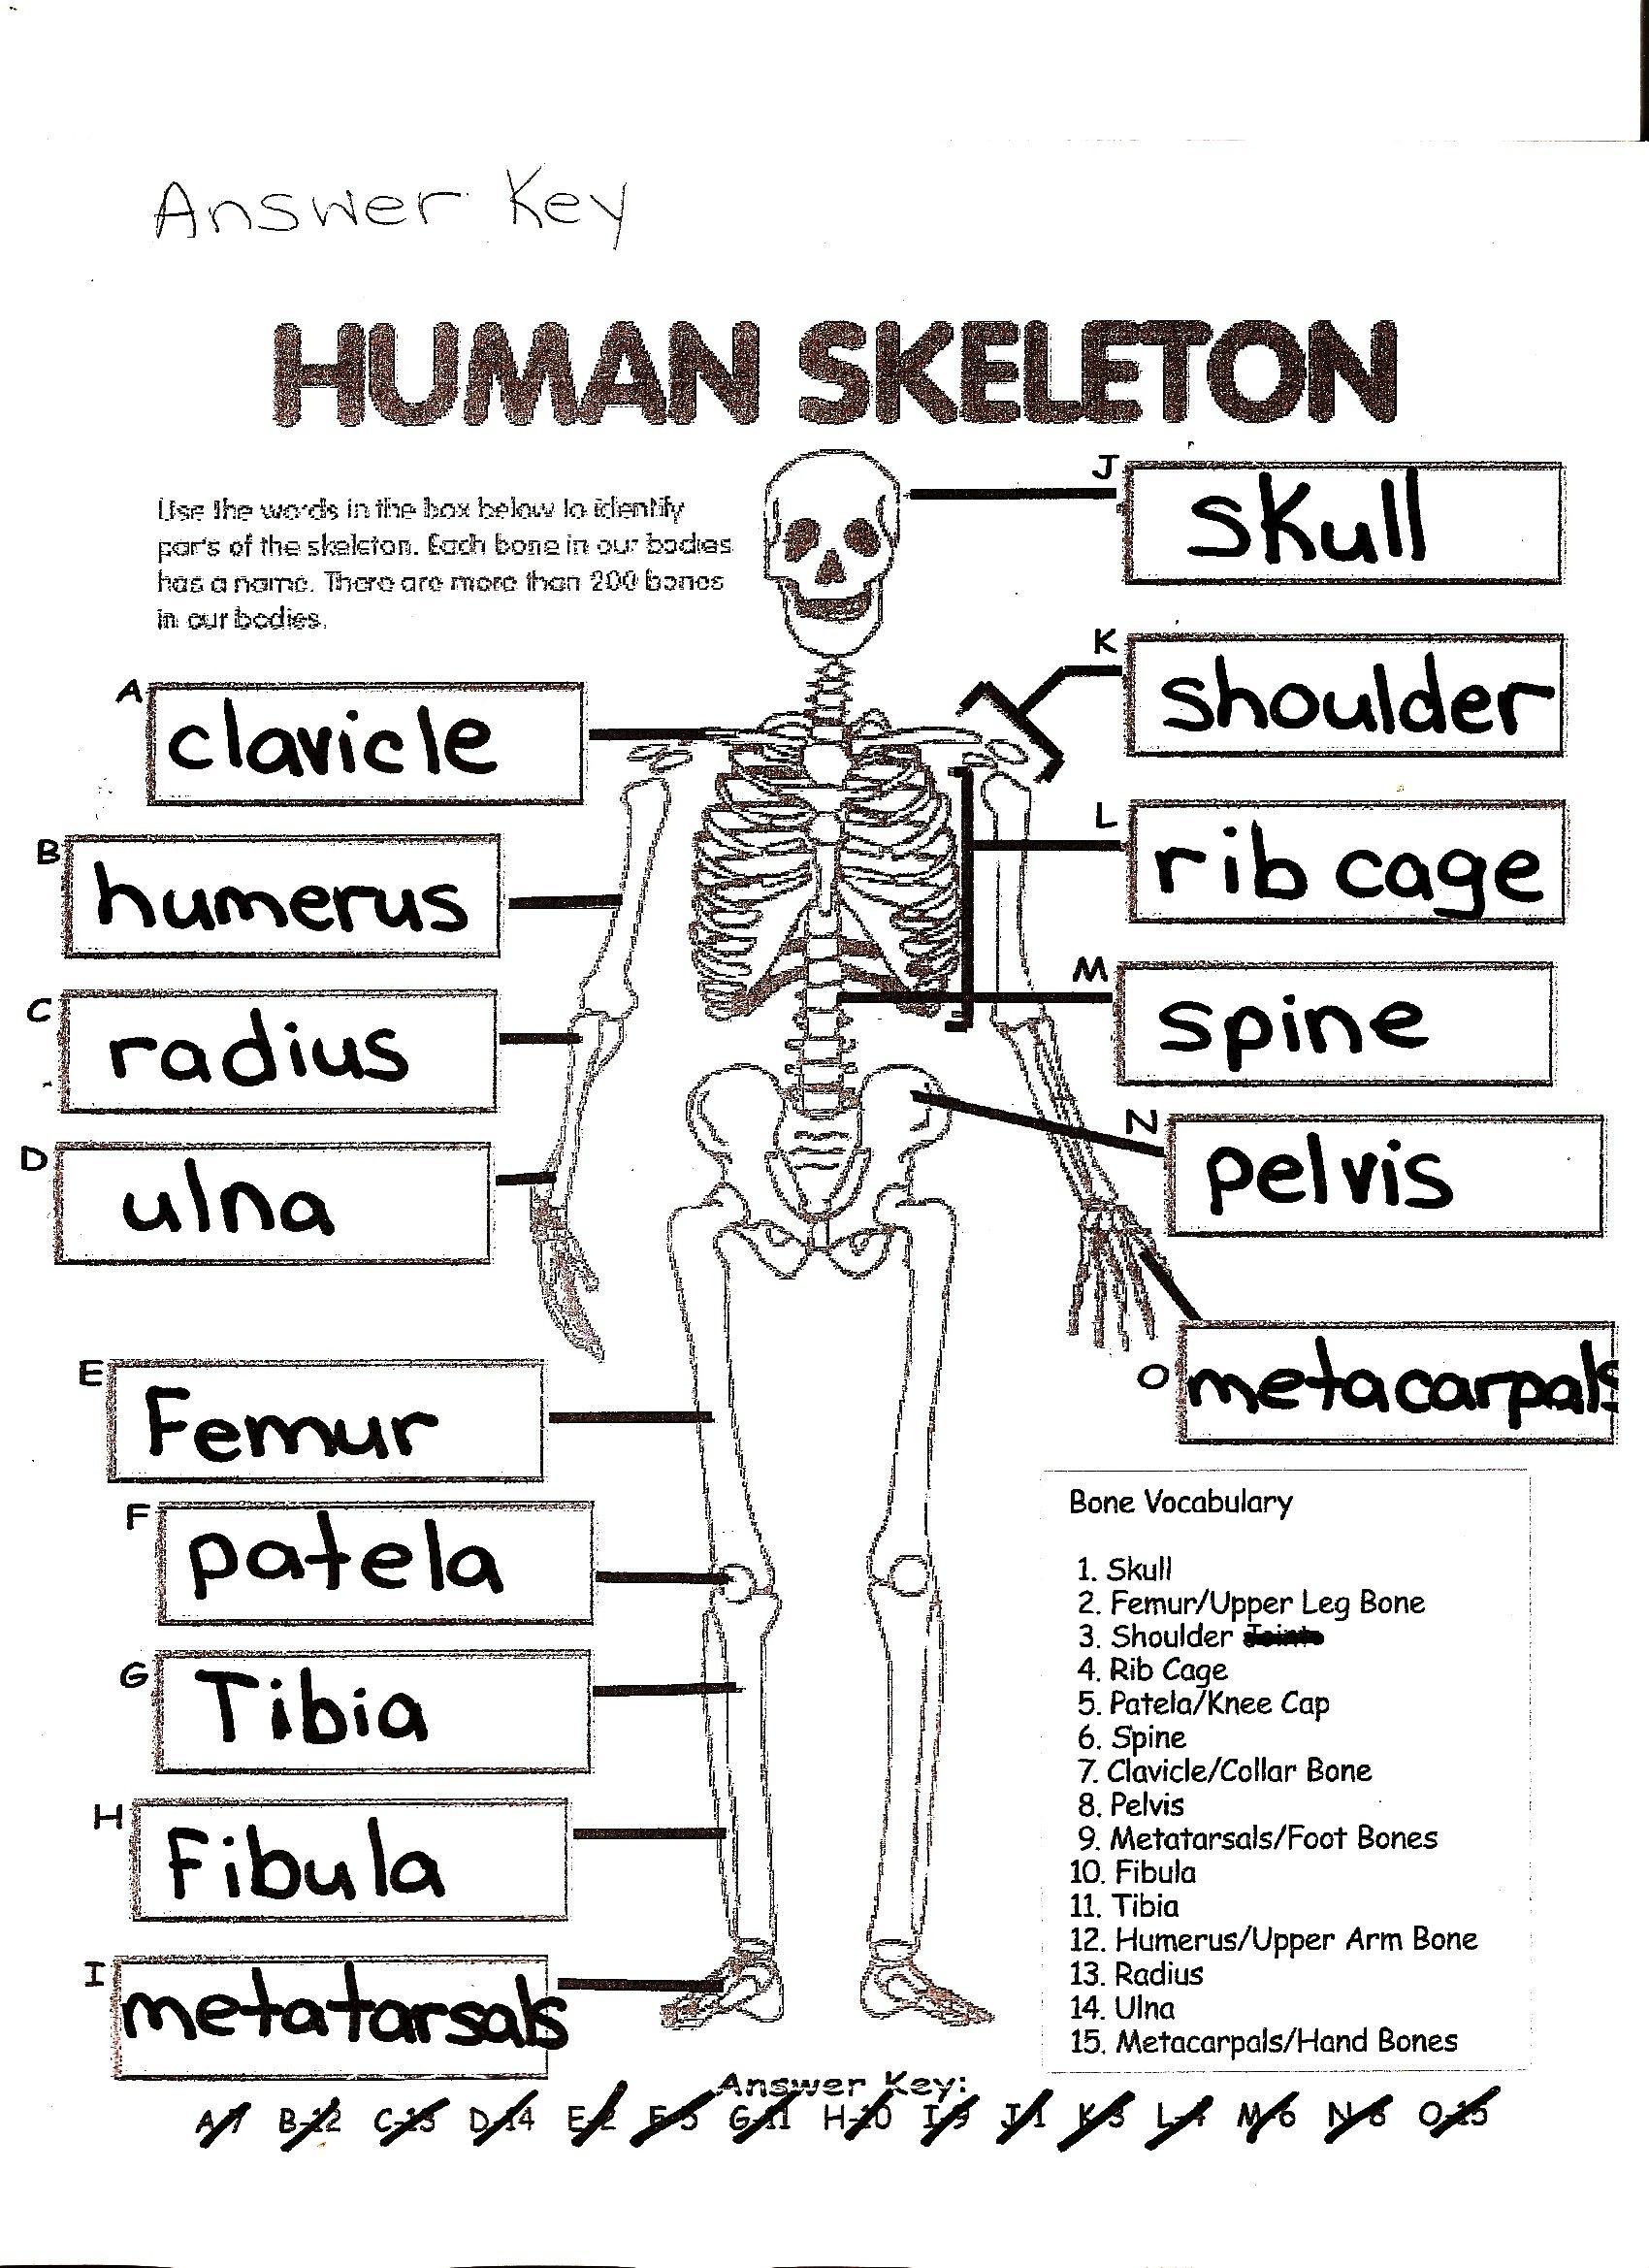 7 General The Skeletal System Worksheet Answers In